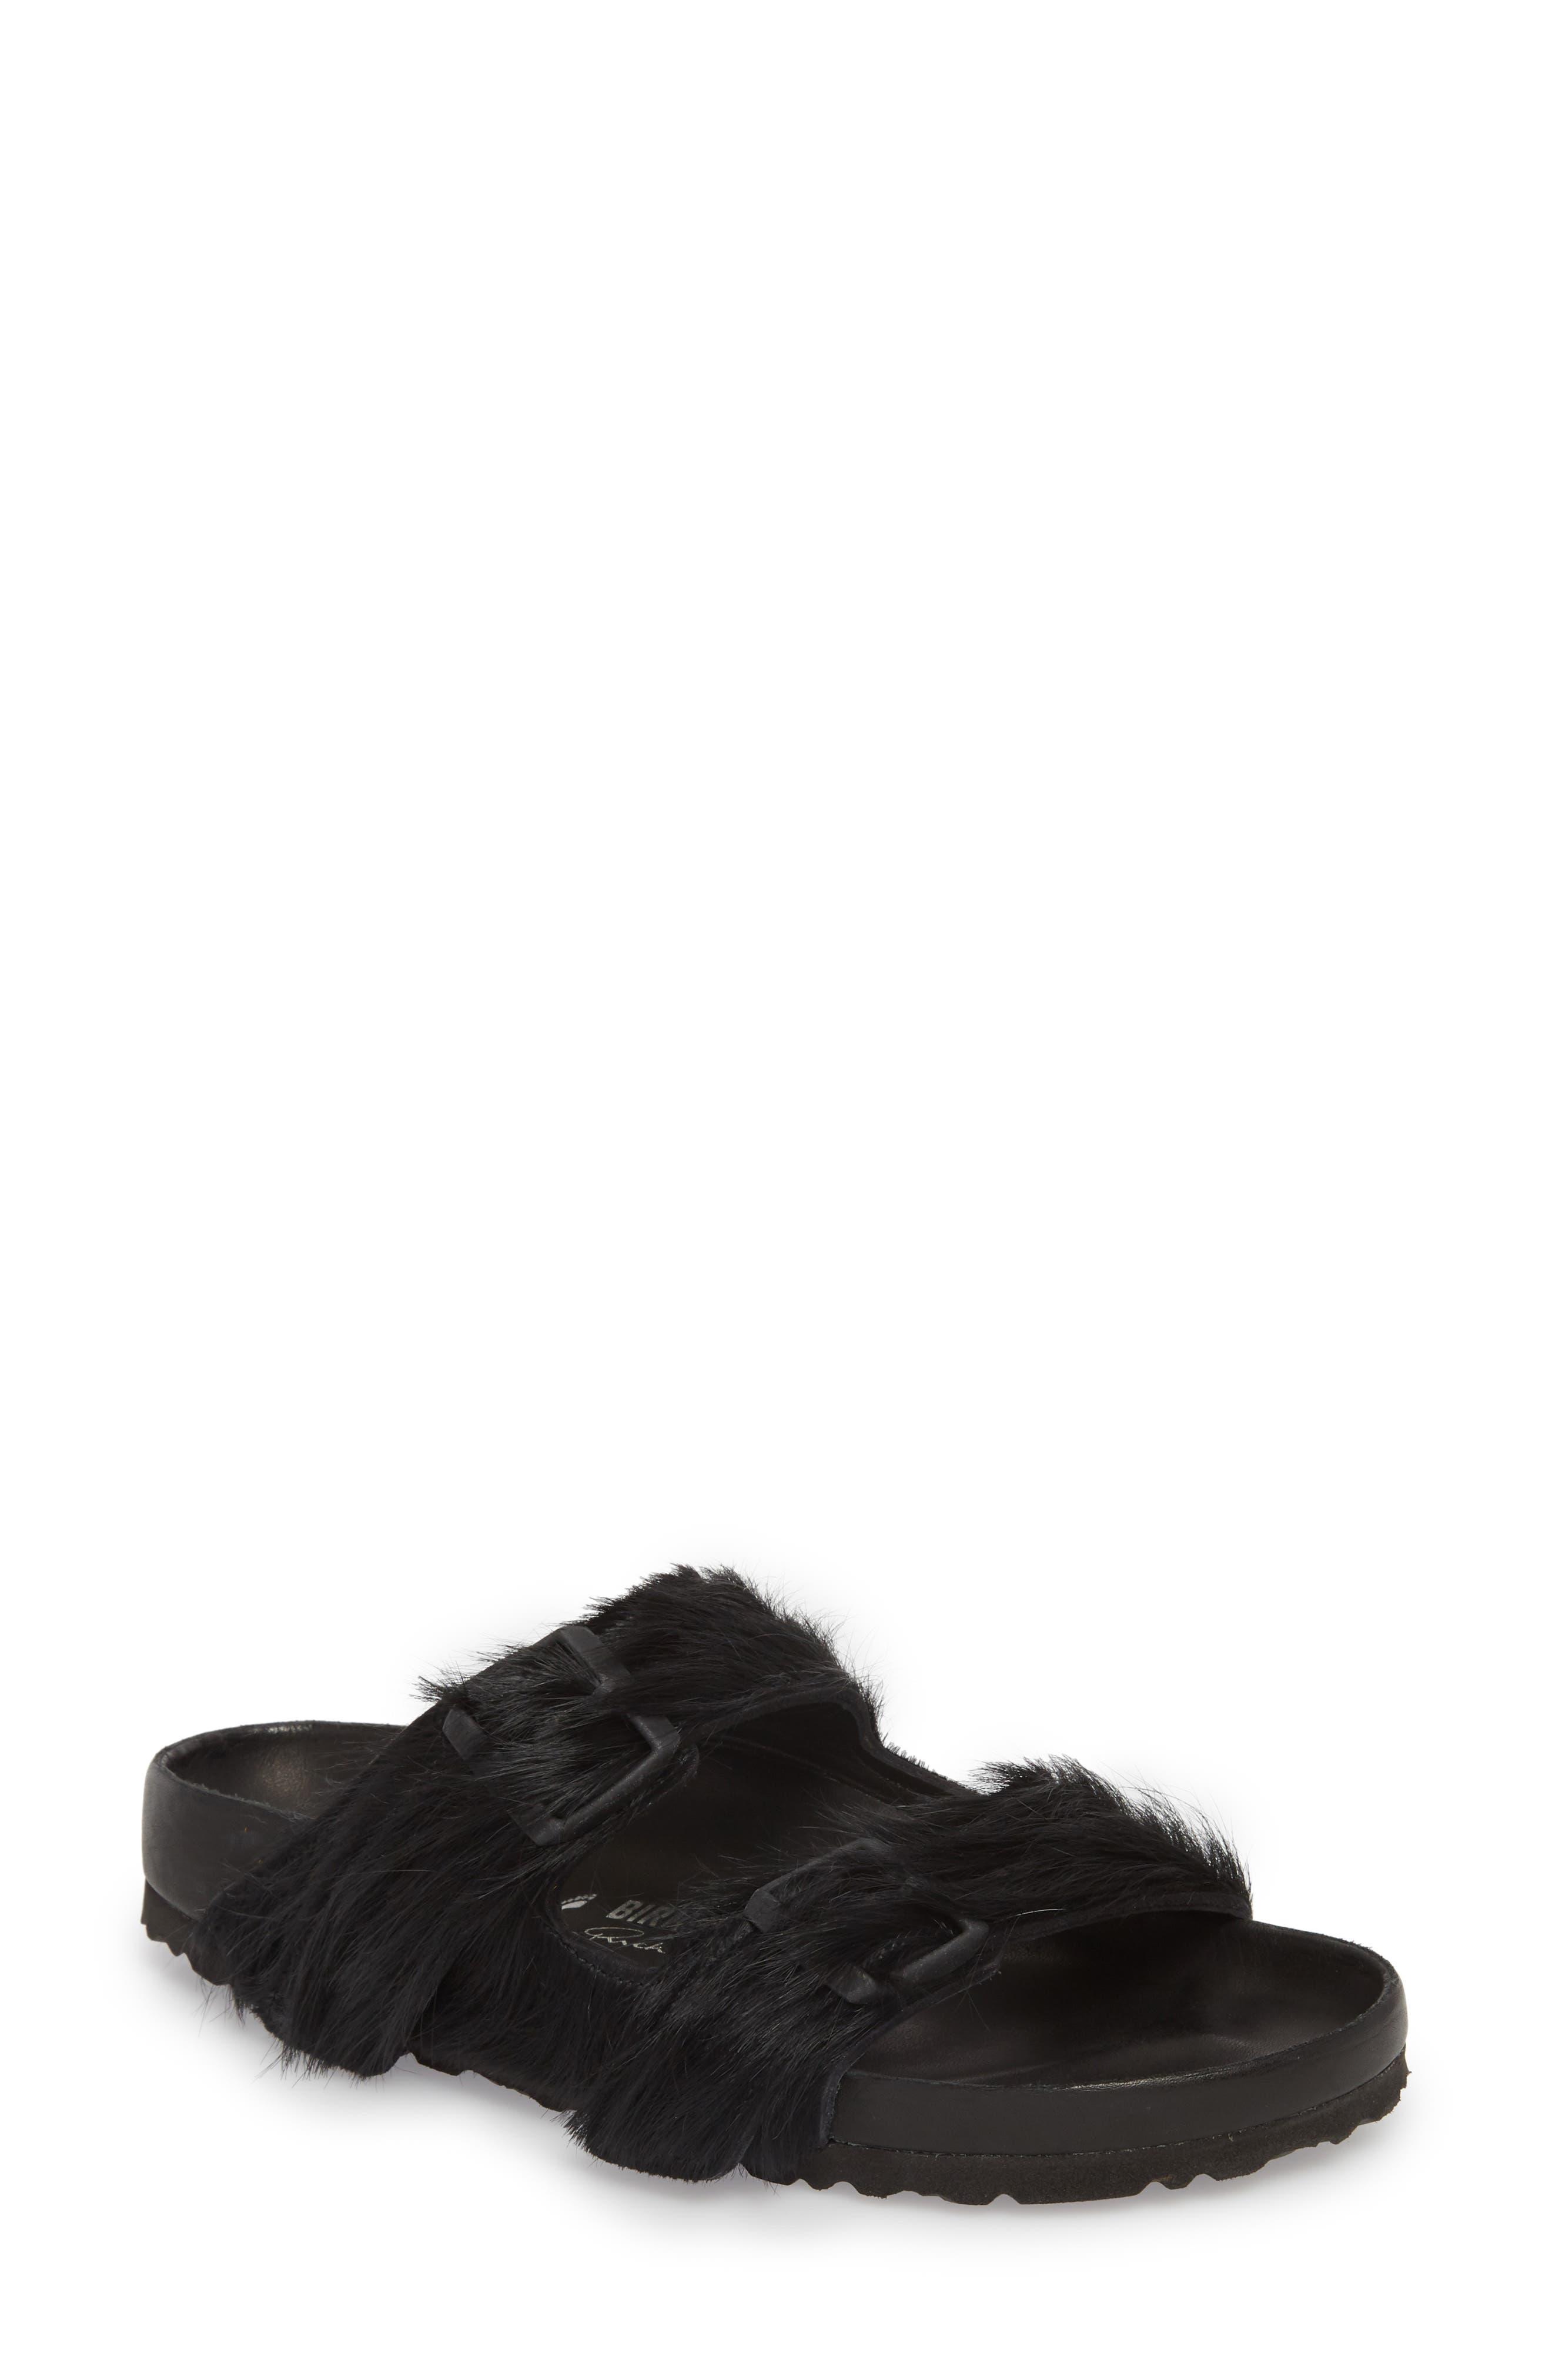 Rick Owens x Birkenstock Arizona Sandal,                         Main,                         color, BLACK CALF HAIR